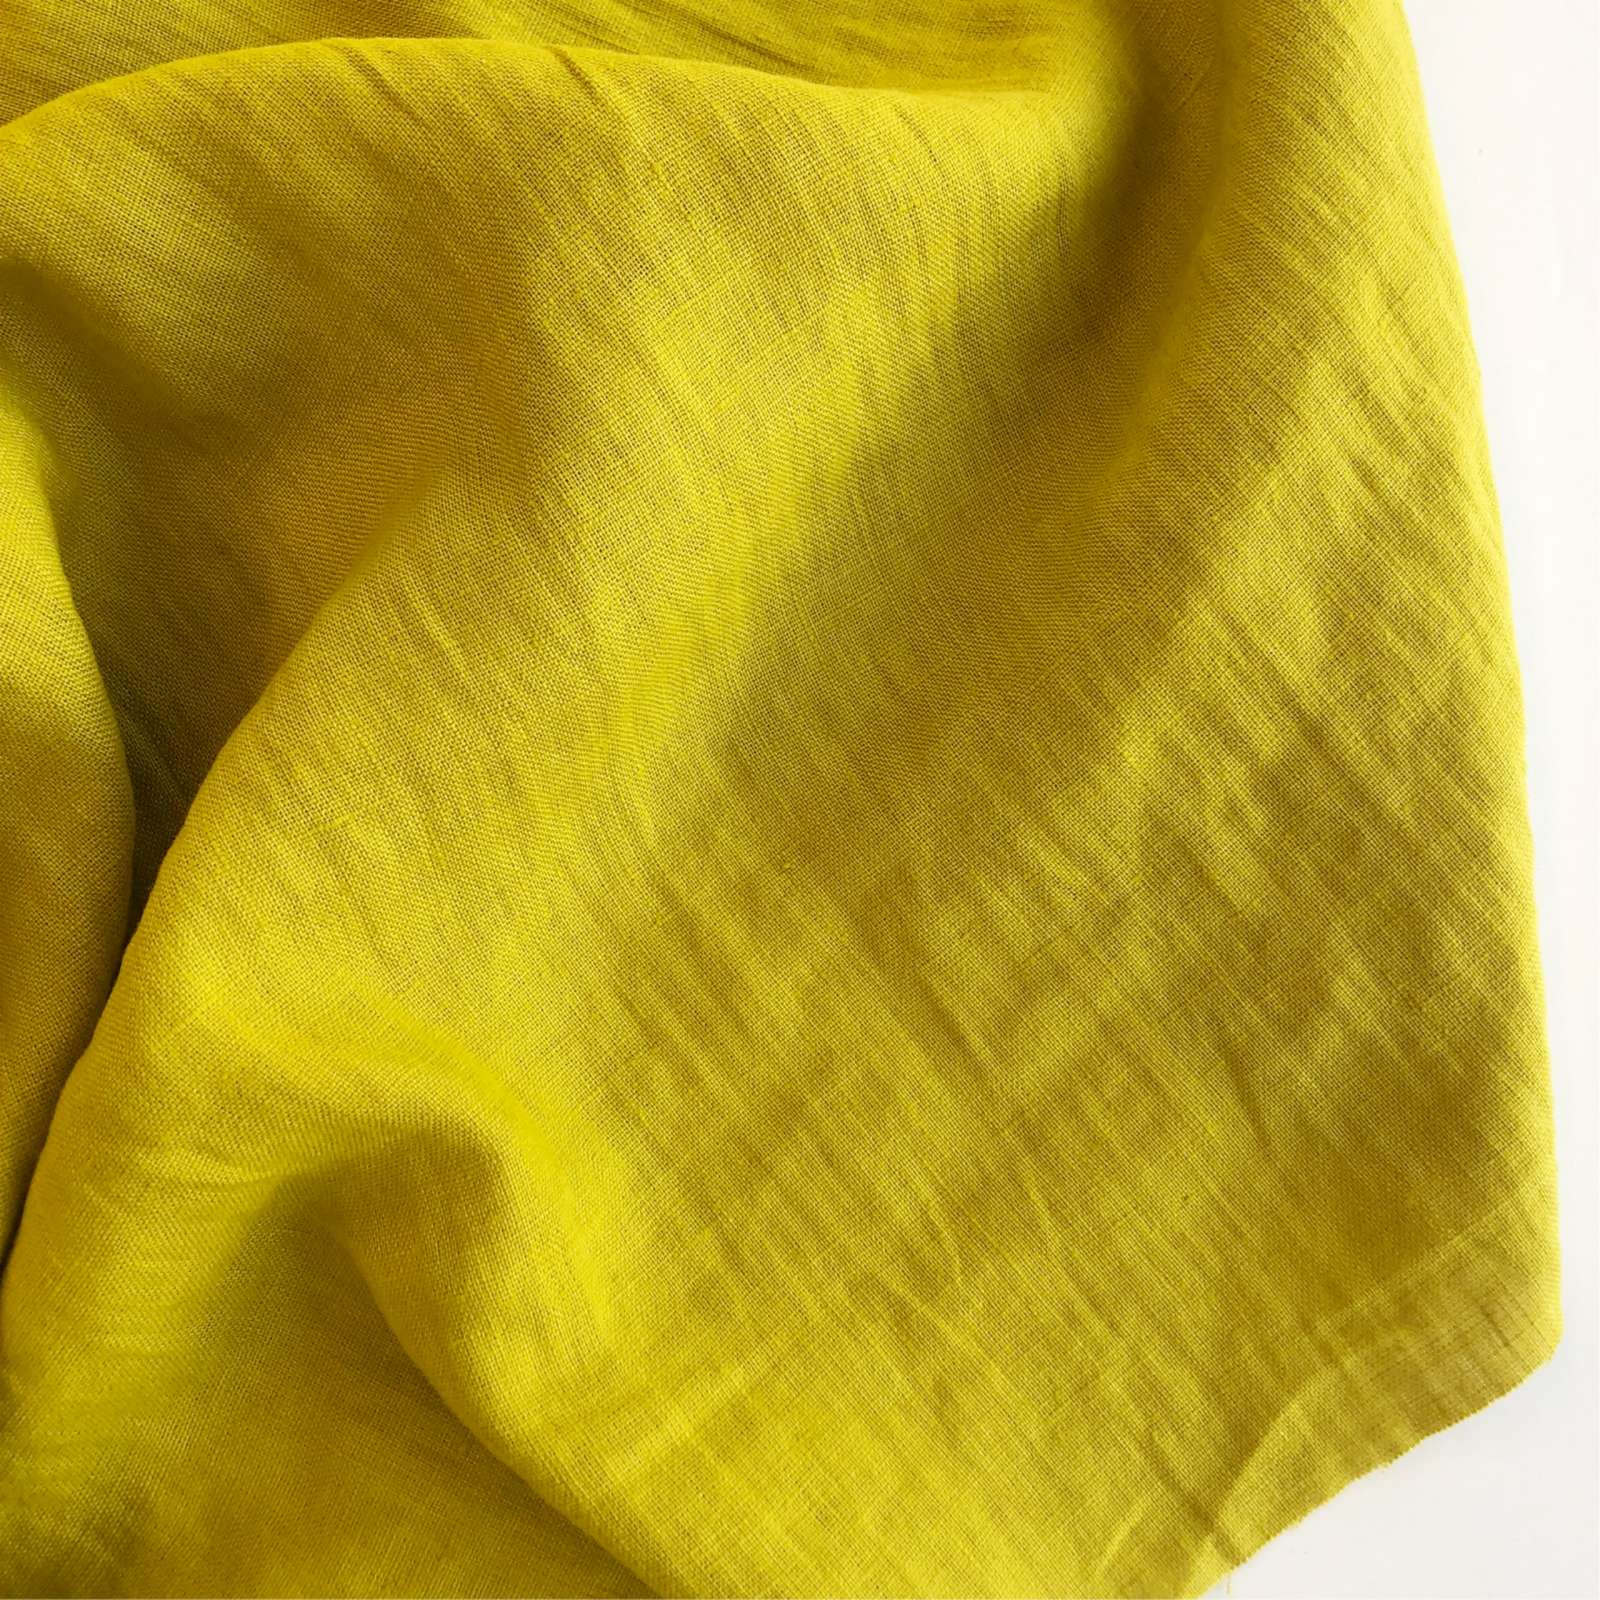 Merchant & Mills Laundered Linen - Chartreuse Yellow 56